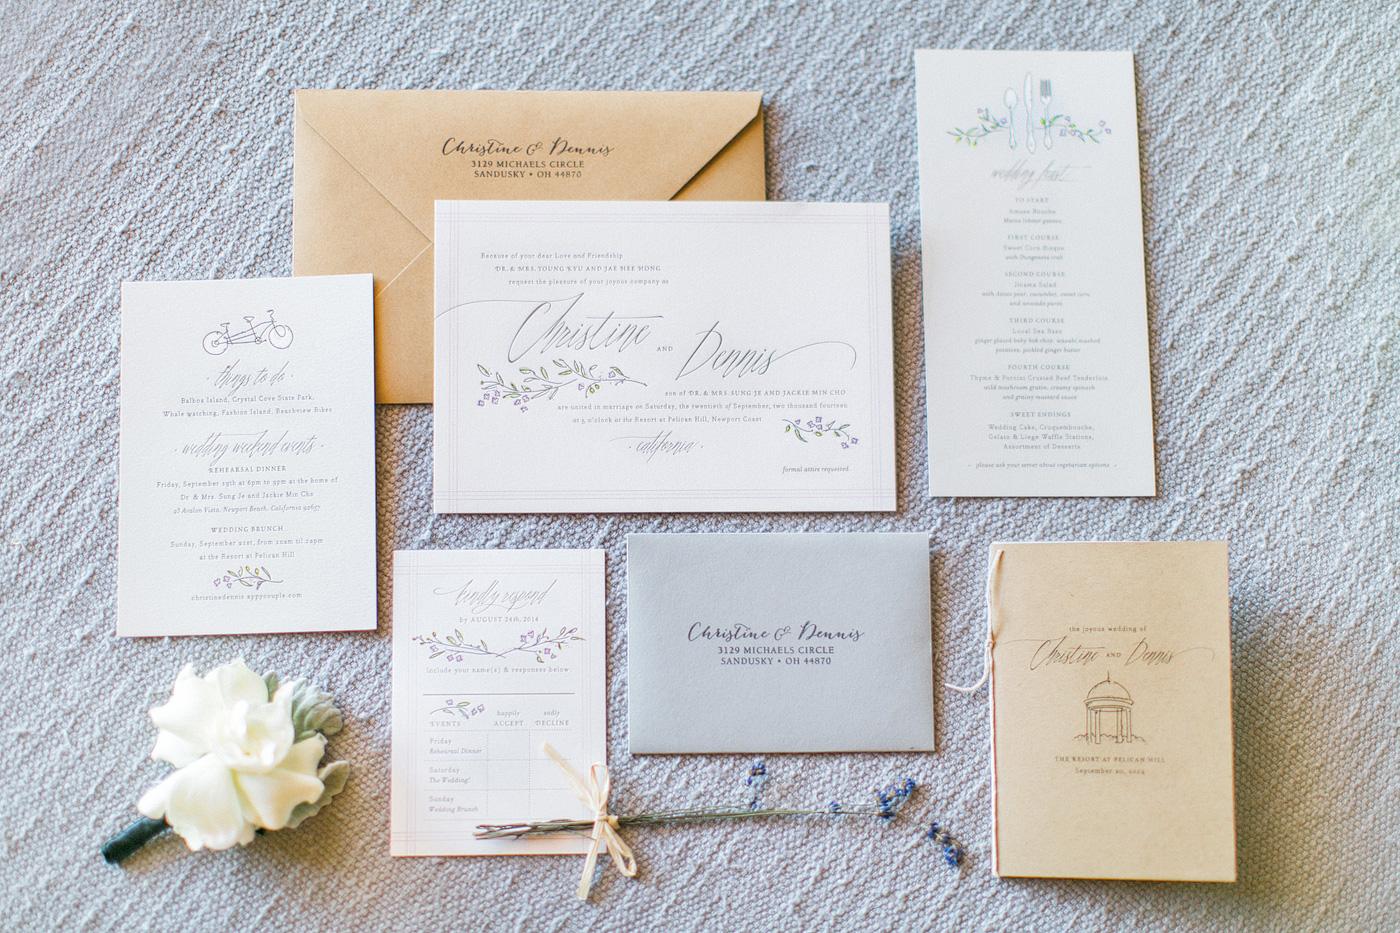 Pelican-hill-wedding-02